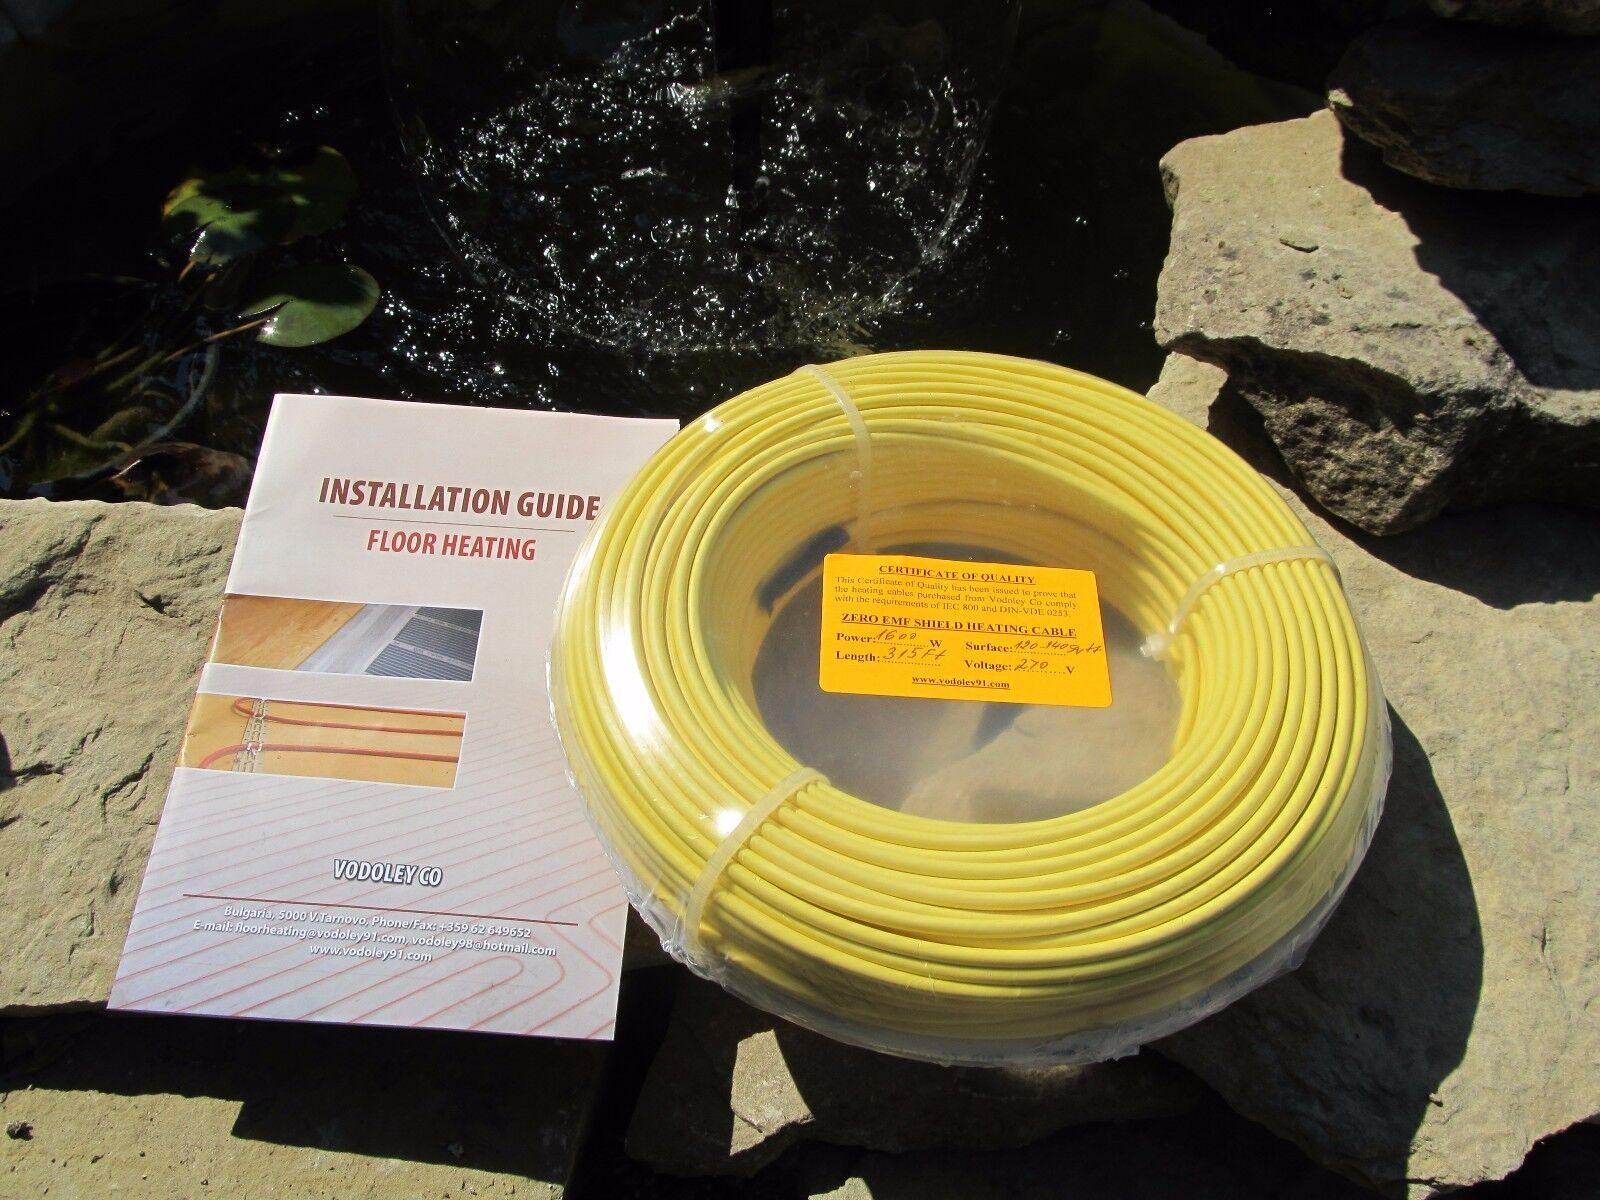 0EMF Warm Tile Under Floor Heating  cable 840 W 55-70 sq.ft.( 5-7 sq.m) 120/240V